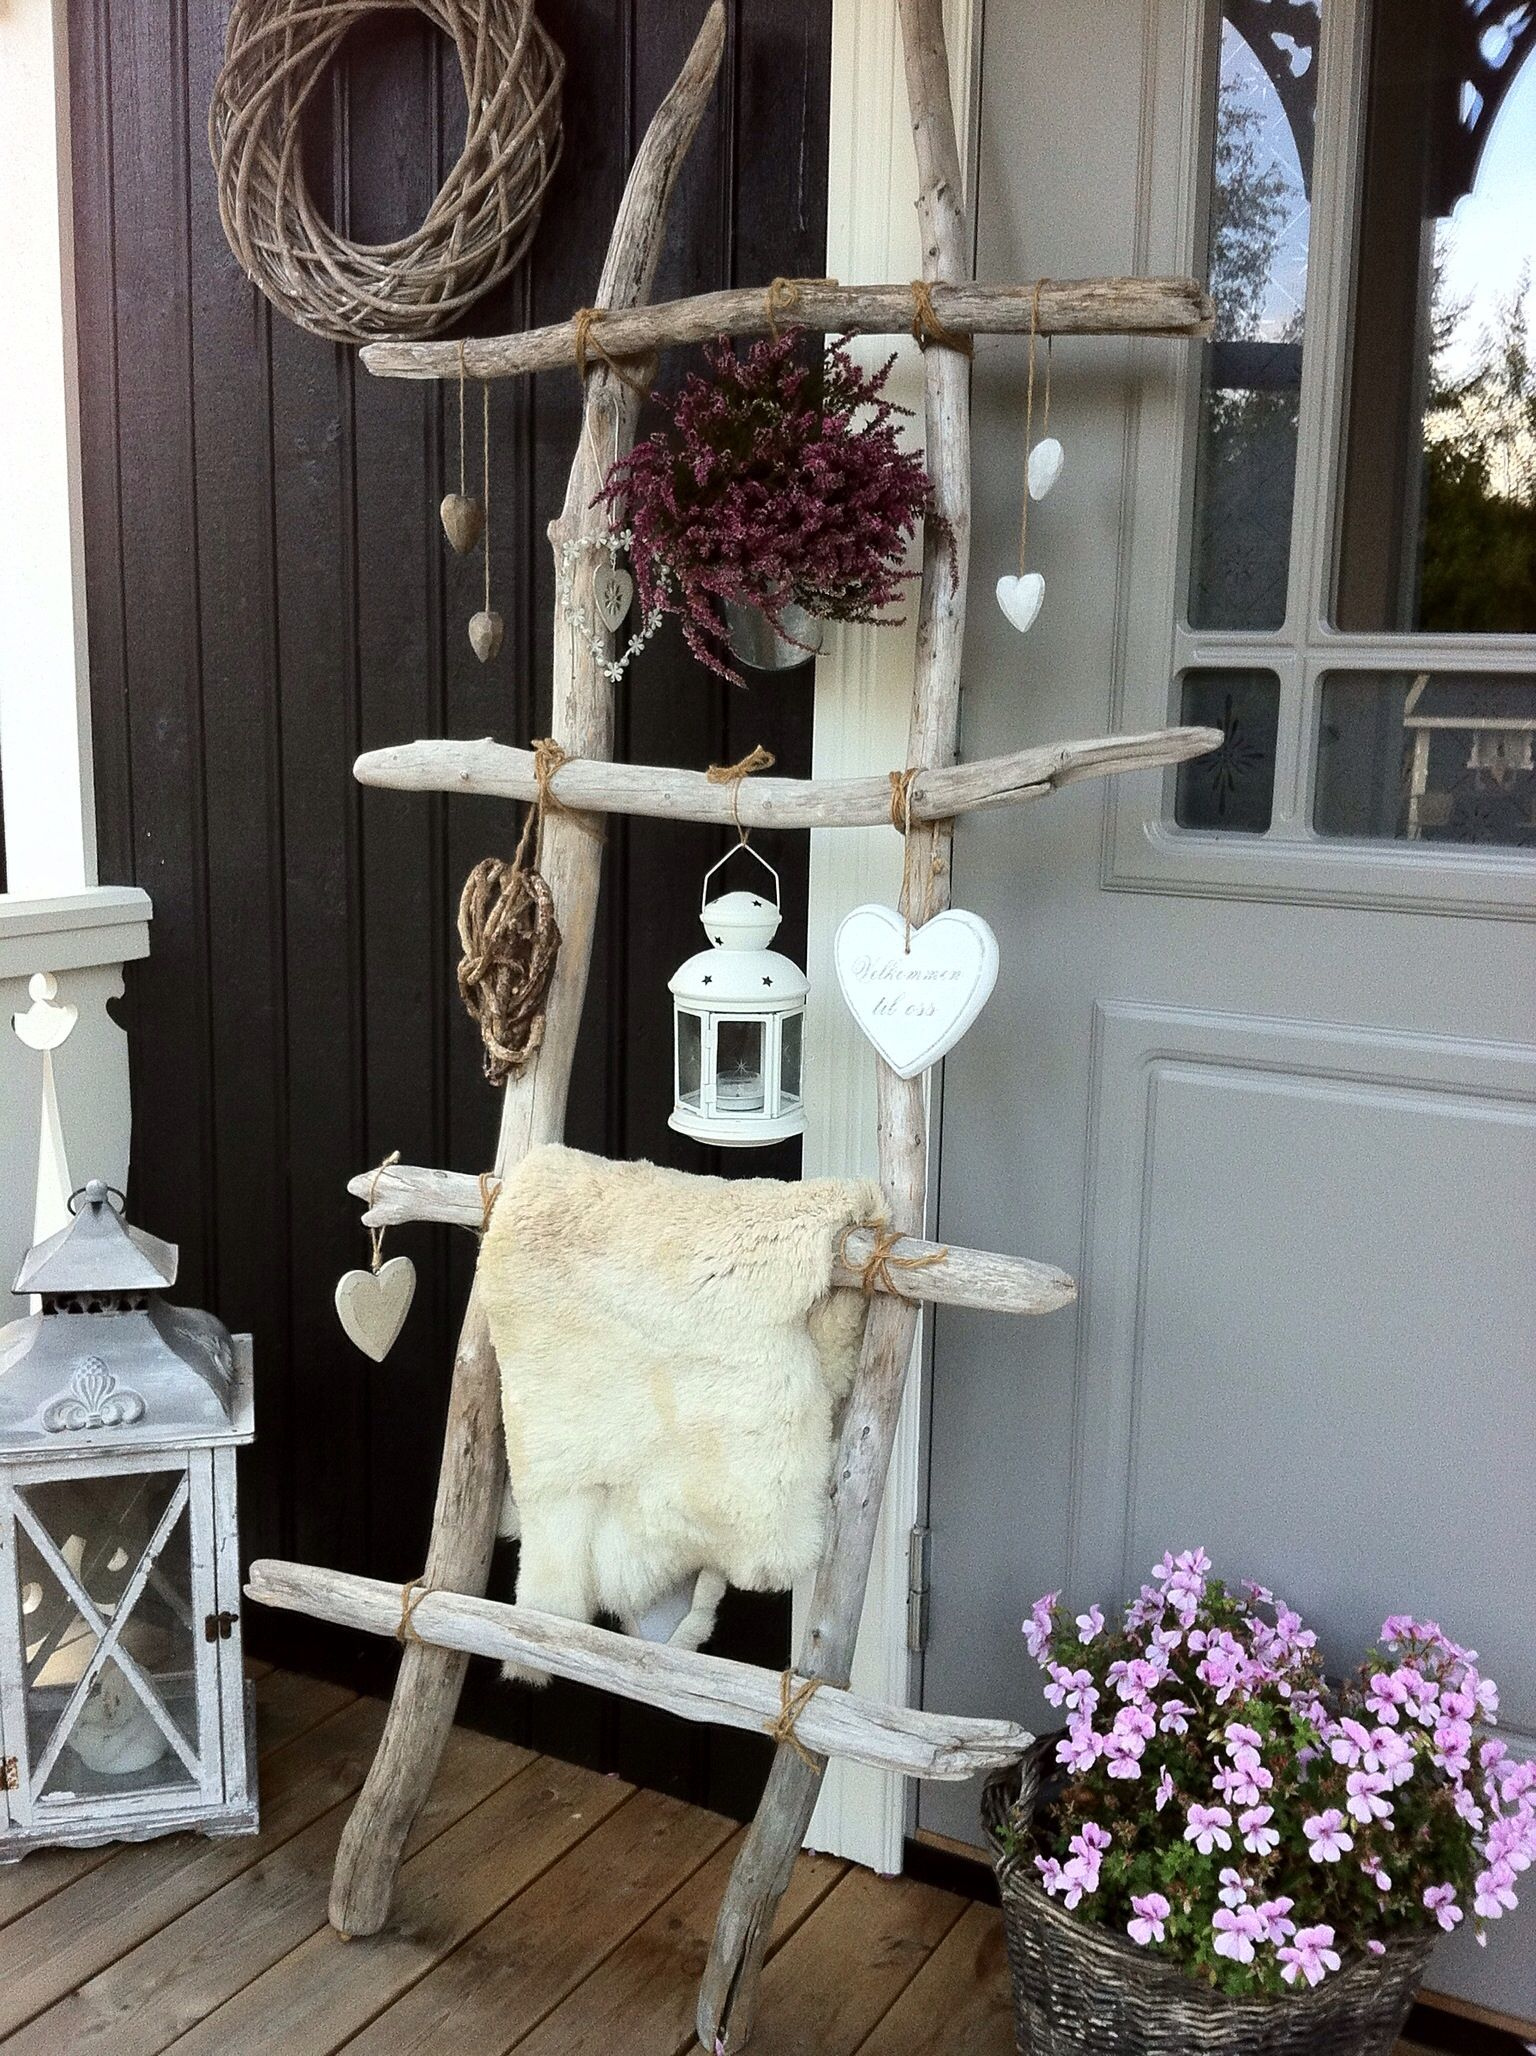 Dekoration haust r herbst pinterest haust ren - Obstkisten dekorieren ...